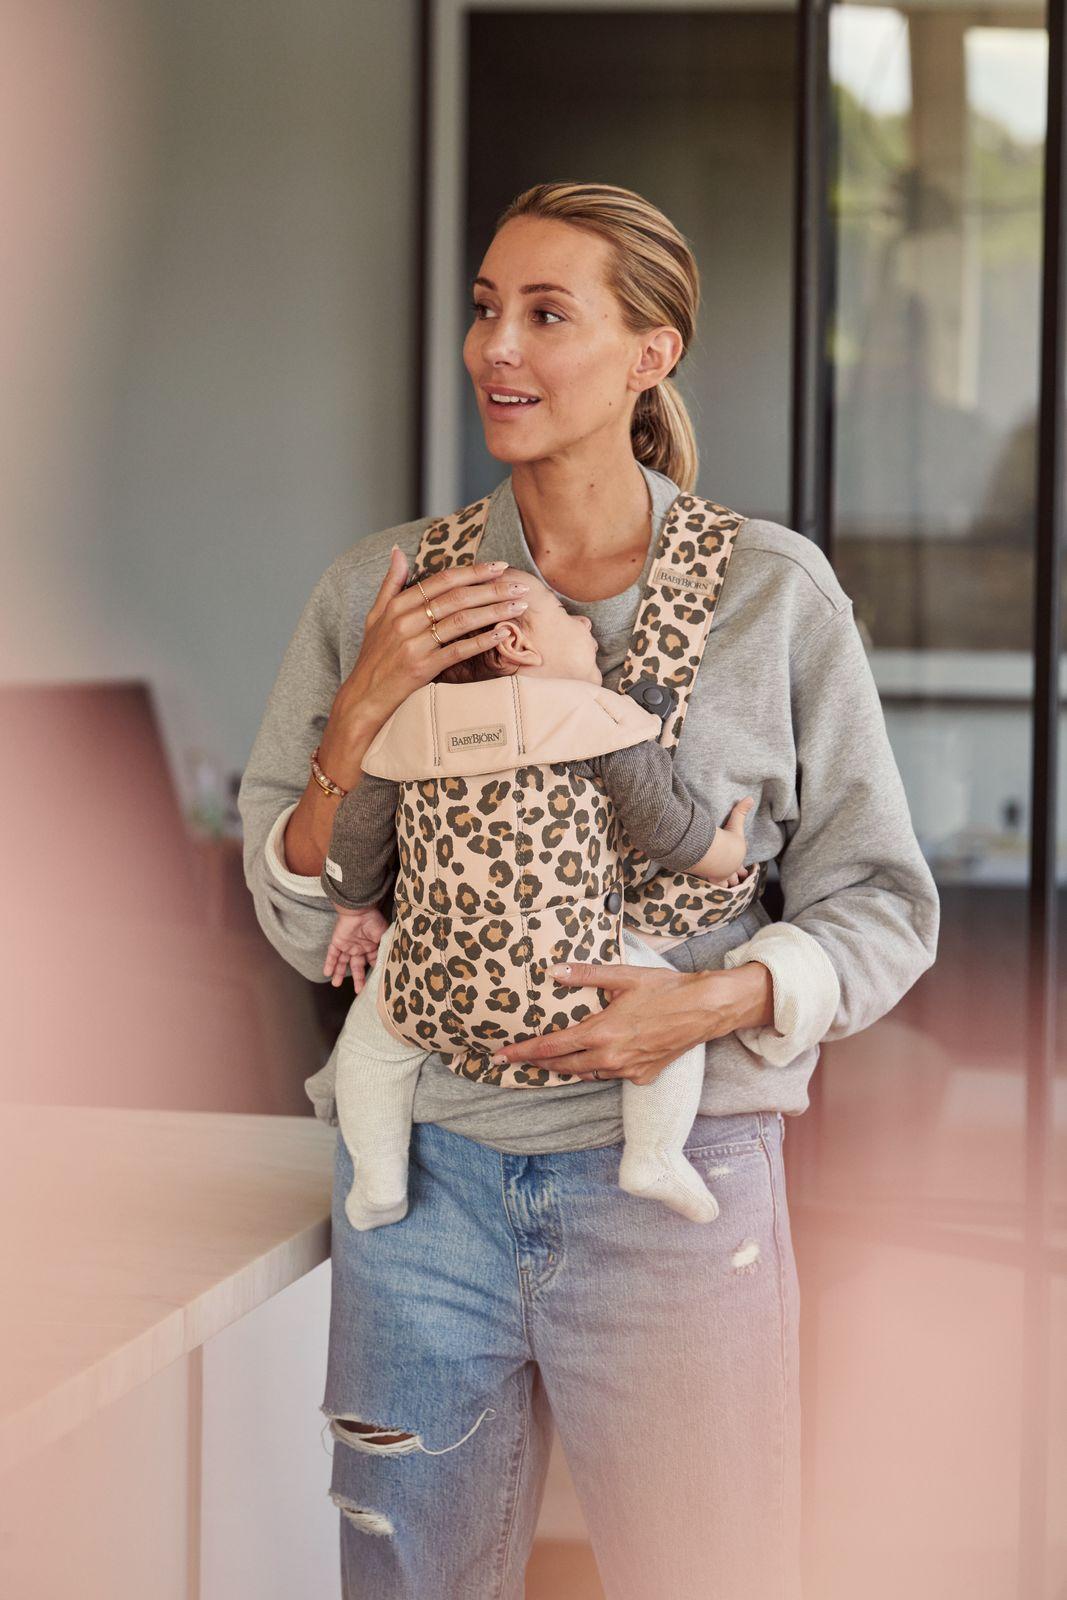 Vyrp14 366021075 Baby Carrier Mini Leo Cotton Lifestyle Babybjorn 19 Medium